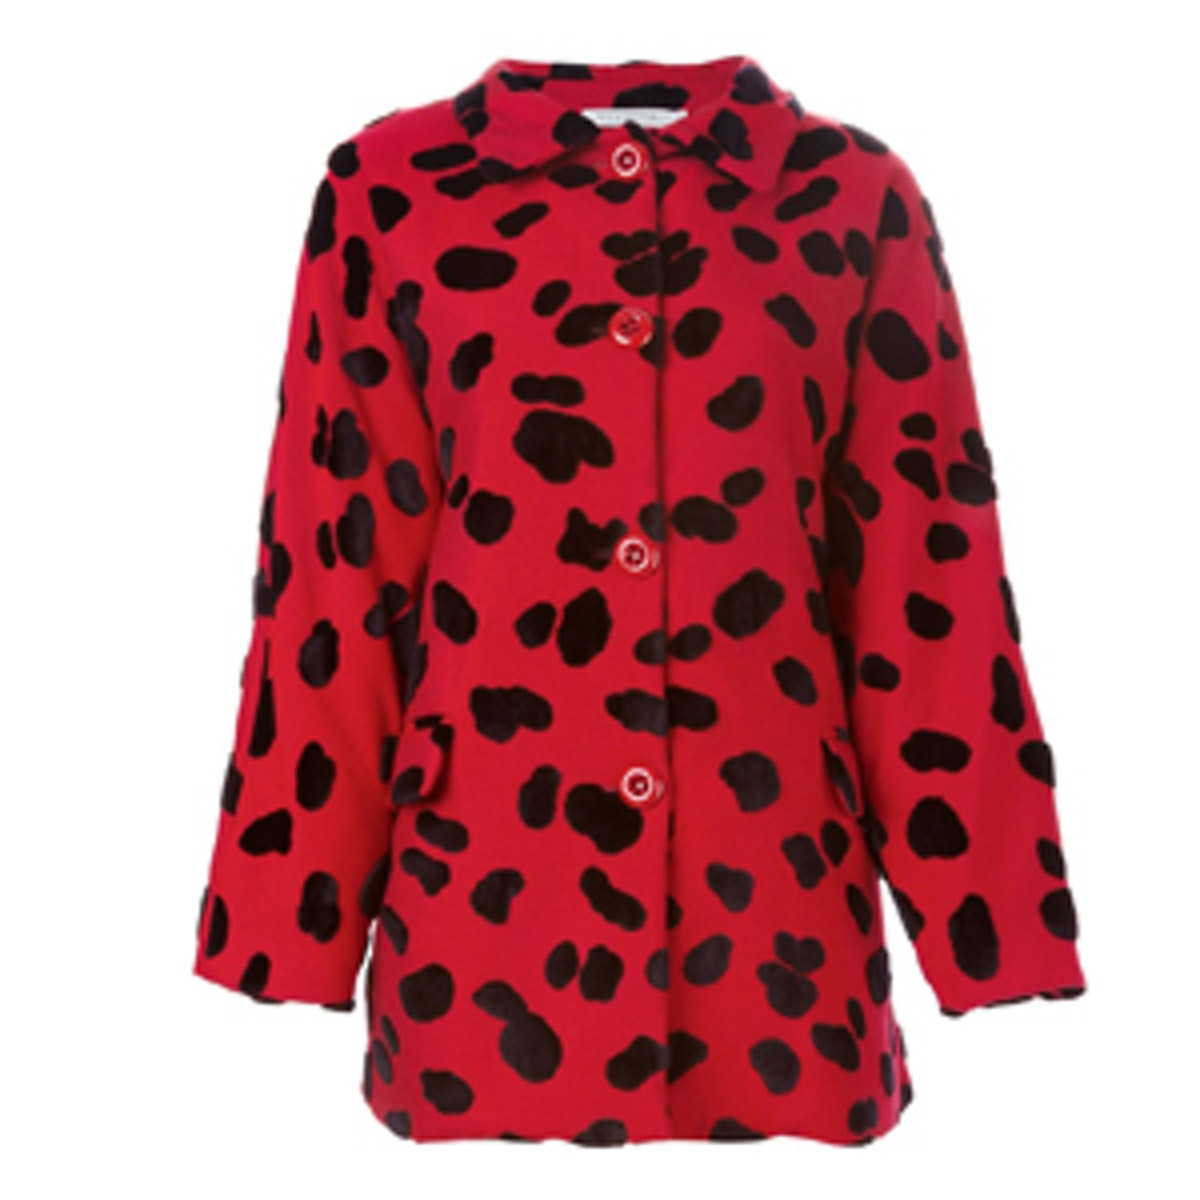 Dalmatian Spotted Coat